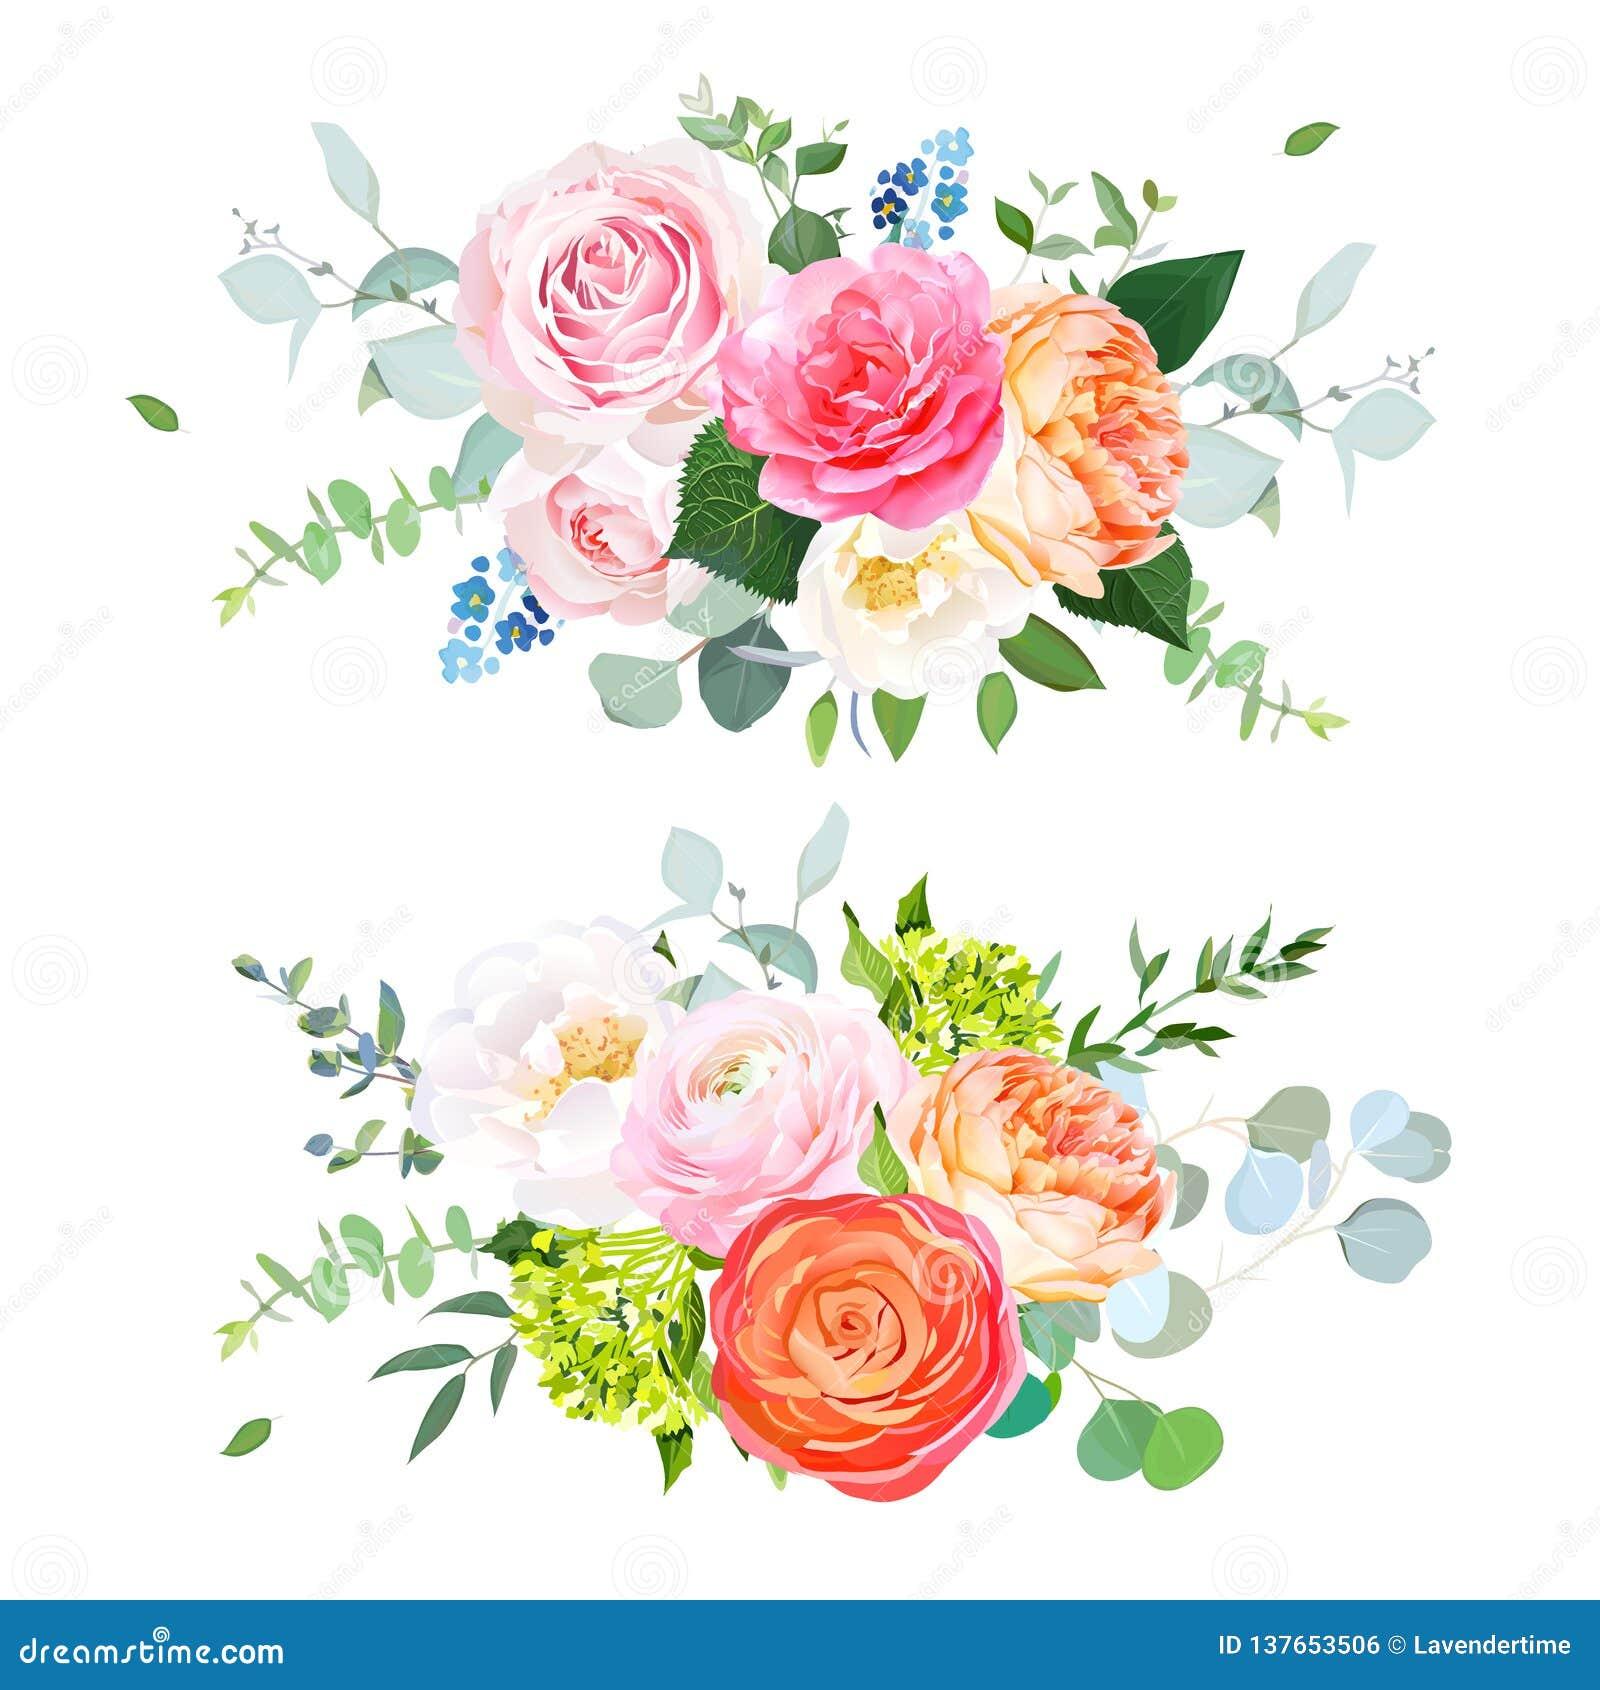 Spring Wedding Flowers Floral Banner Stock Vector Illustration Of Blossom Rose 137653506